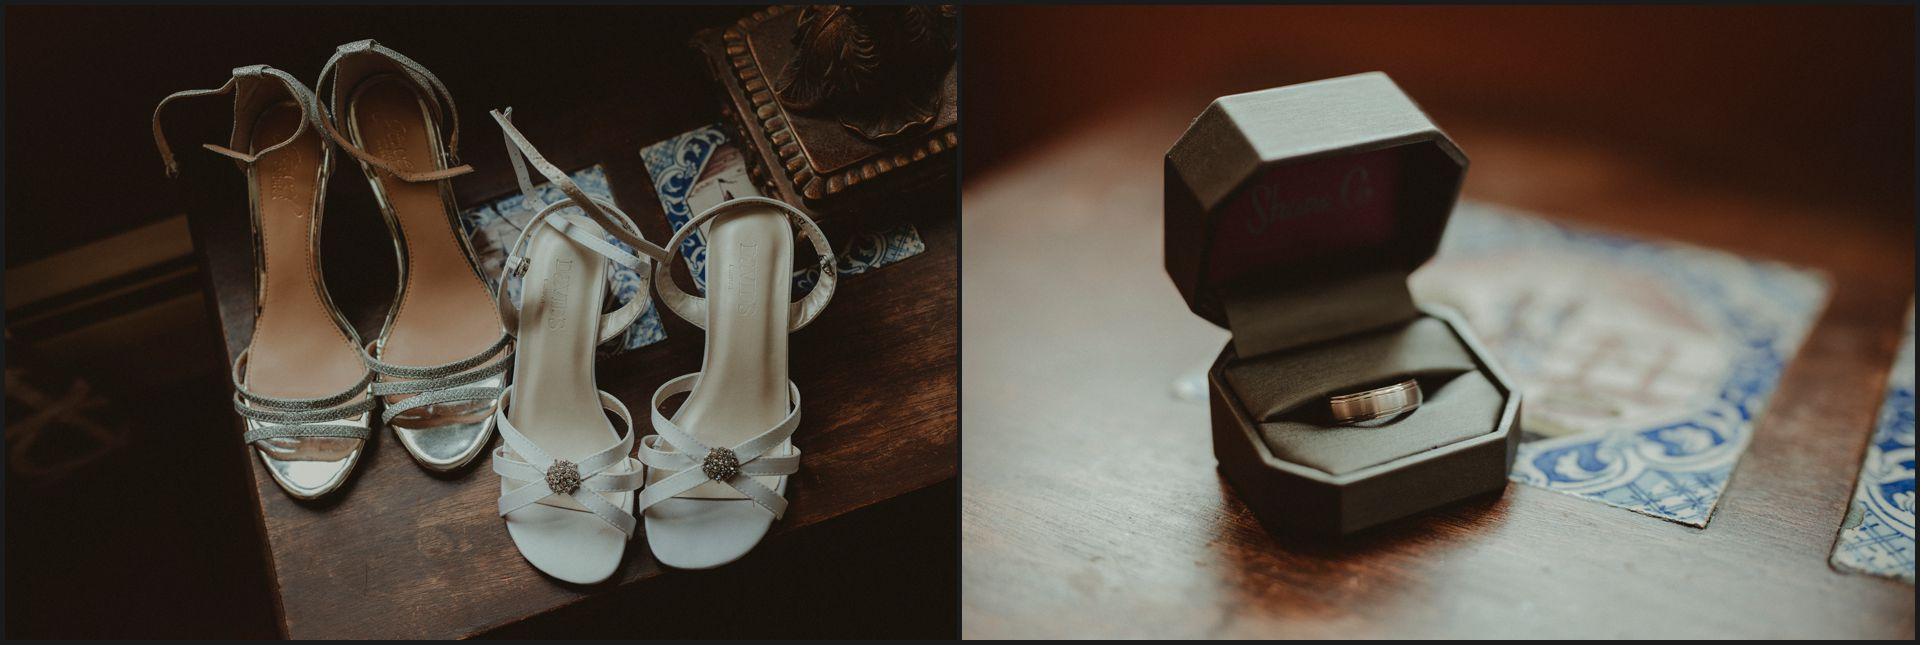 wedding, wedding shoes, rings, wedding band, bridal shoes, bride